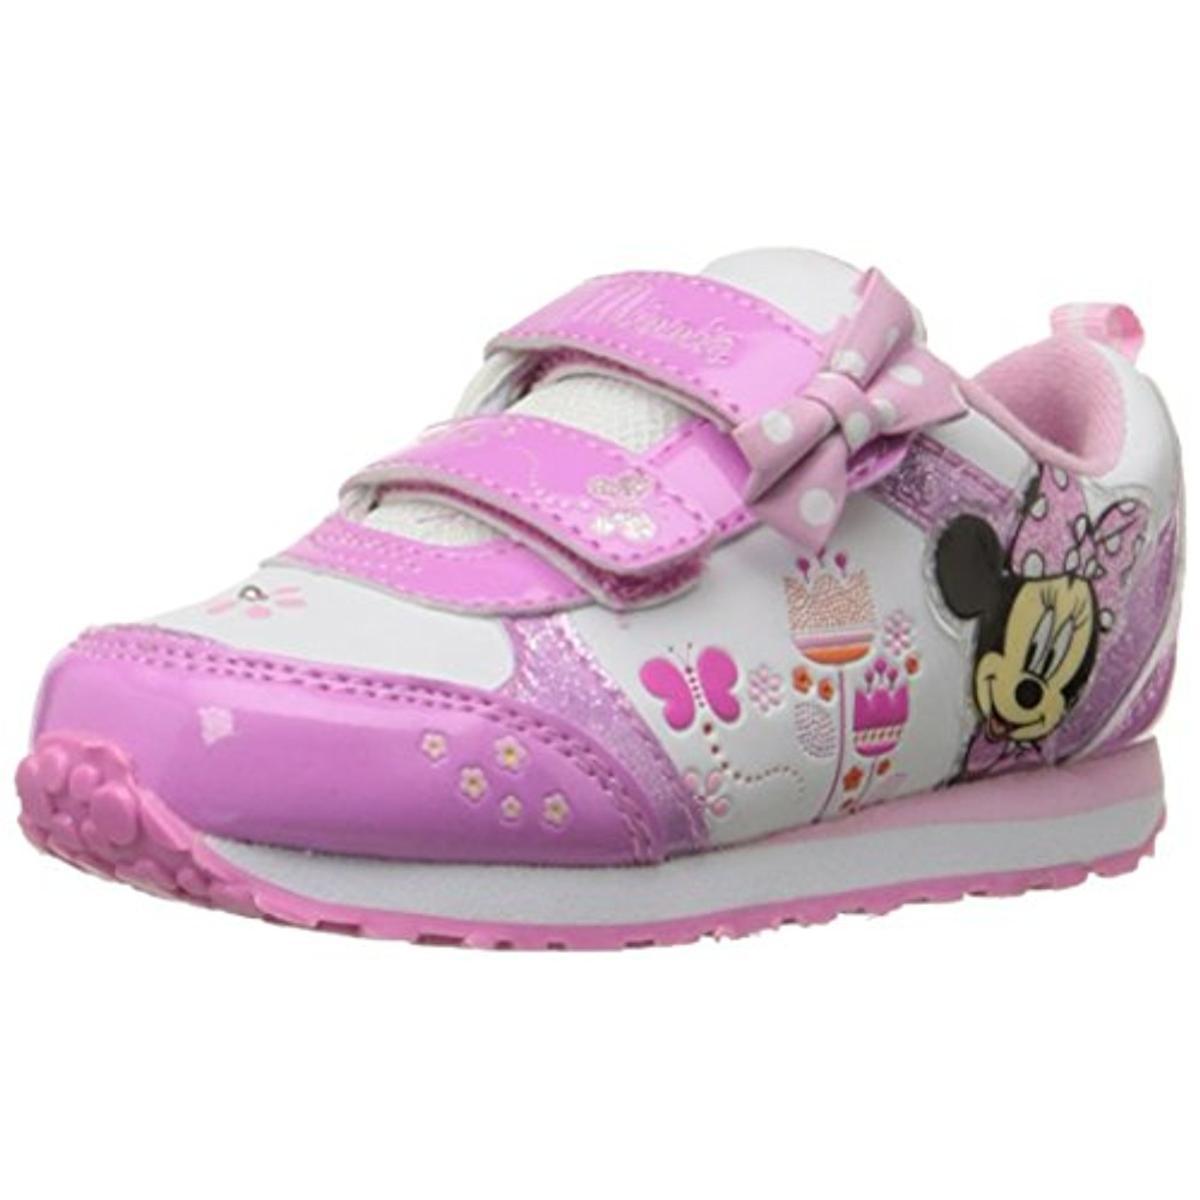 Disney Girls Minnie Mouse Light Up